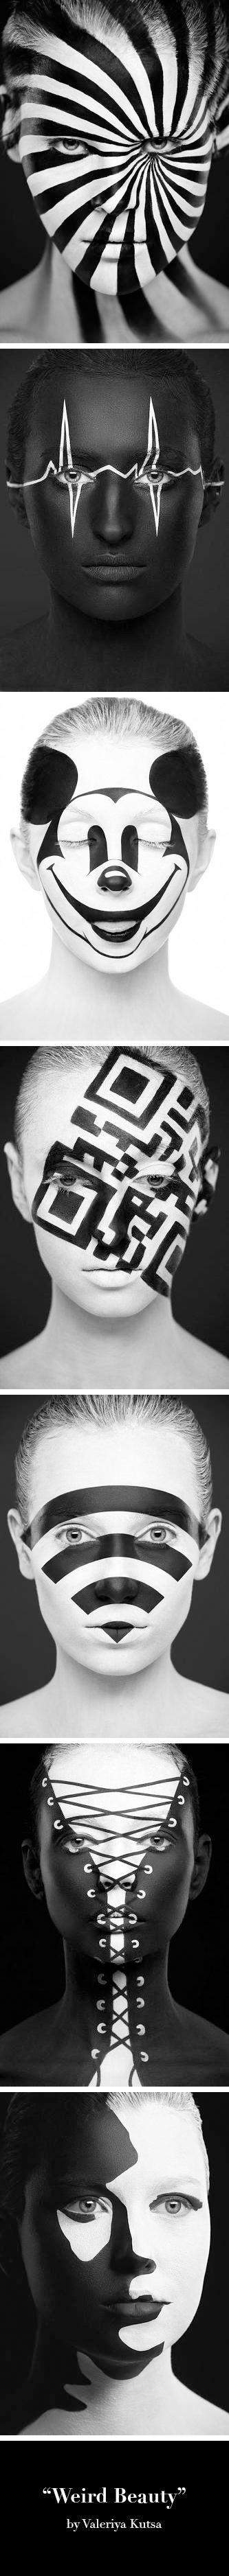 """Weird Beauty"" der russischen Visagistin Valeriya Kutsan. Fotografie von Alexand …   – Alexandre Khoklov"